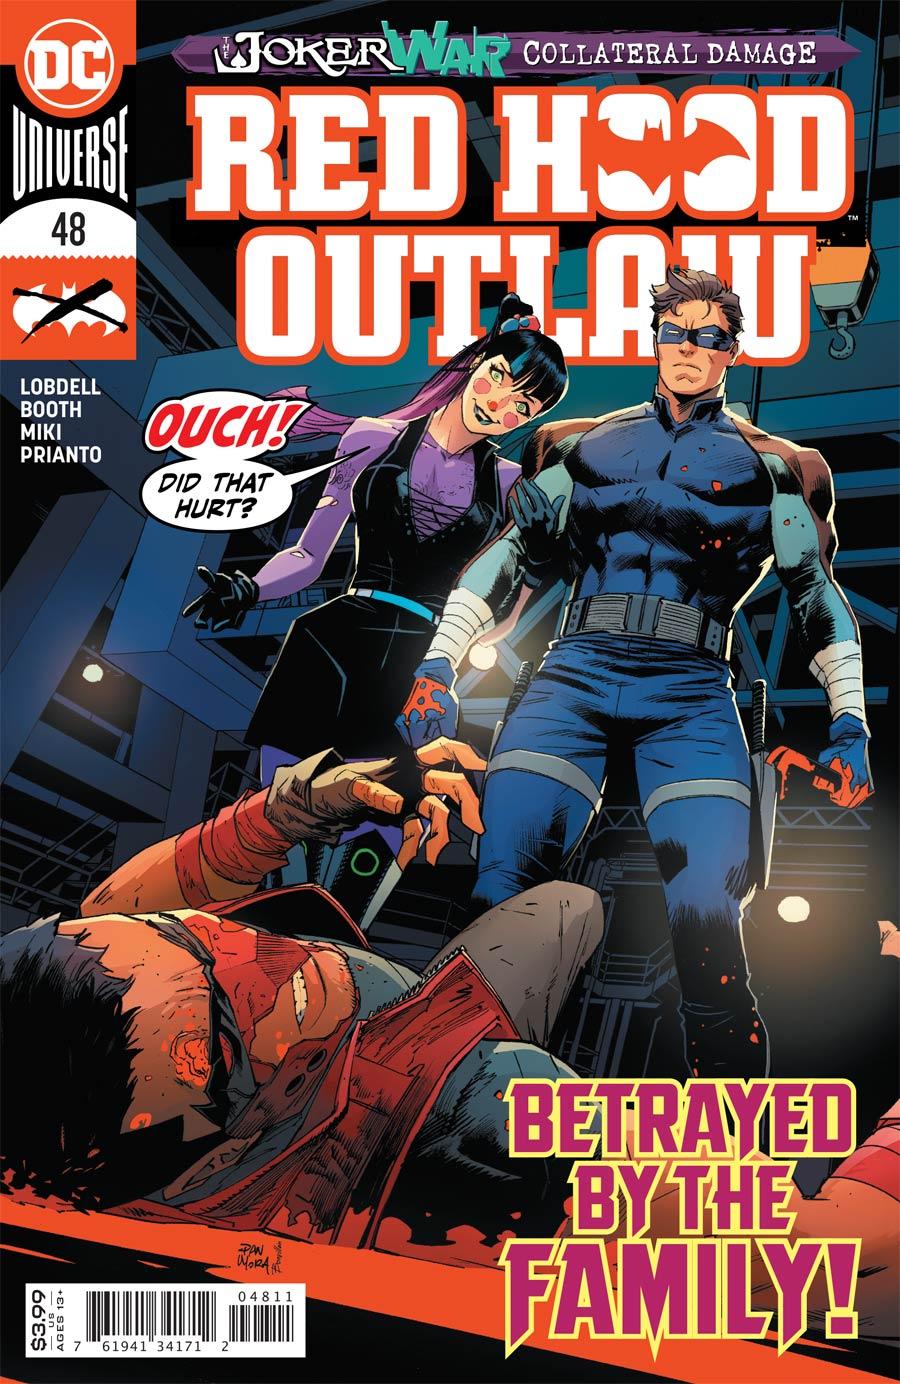 Red Hood Outlaw #48 Cover A Regular Dan Mora Cover (Joker War Tie-In)